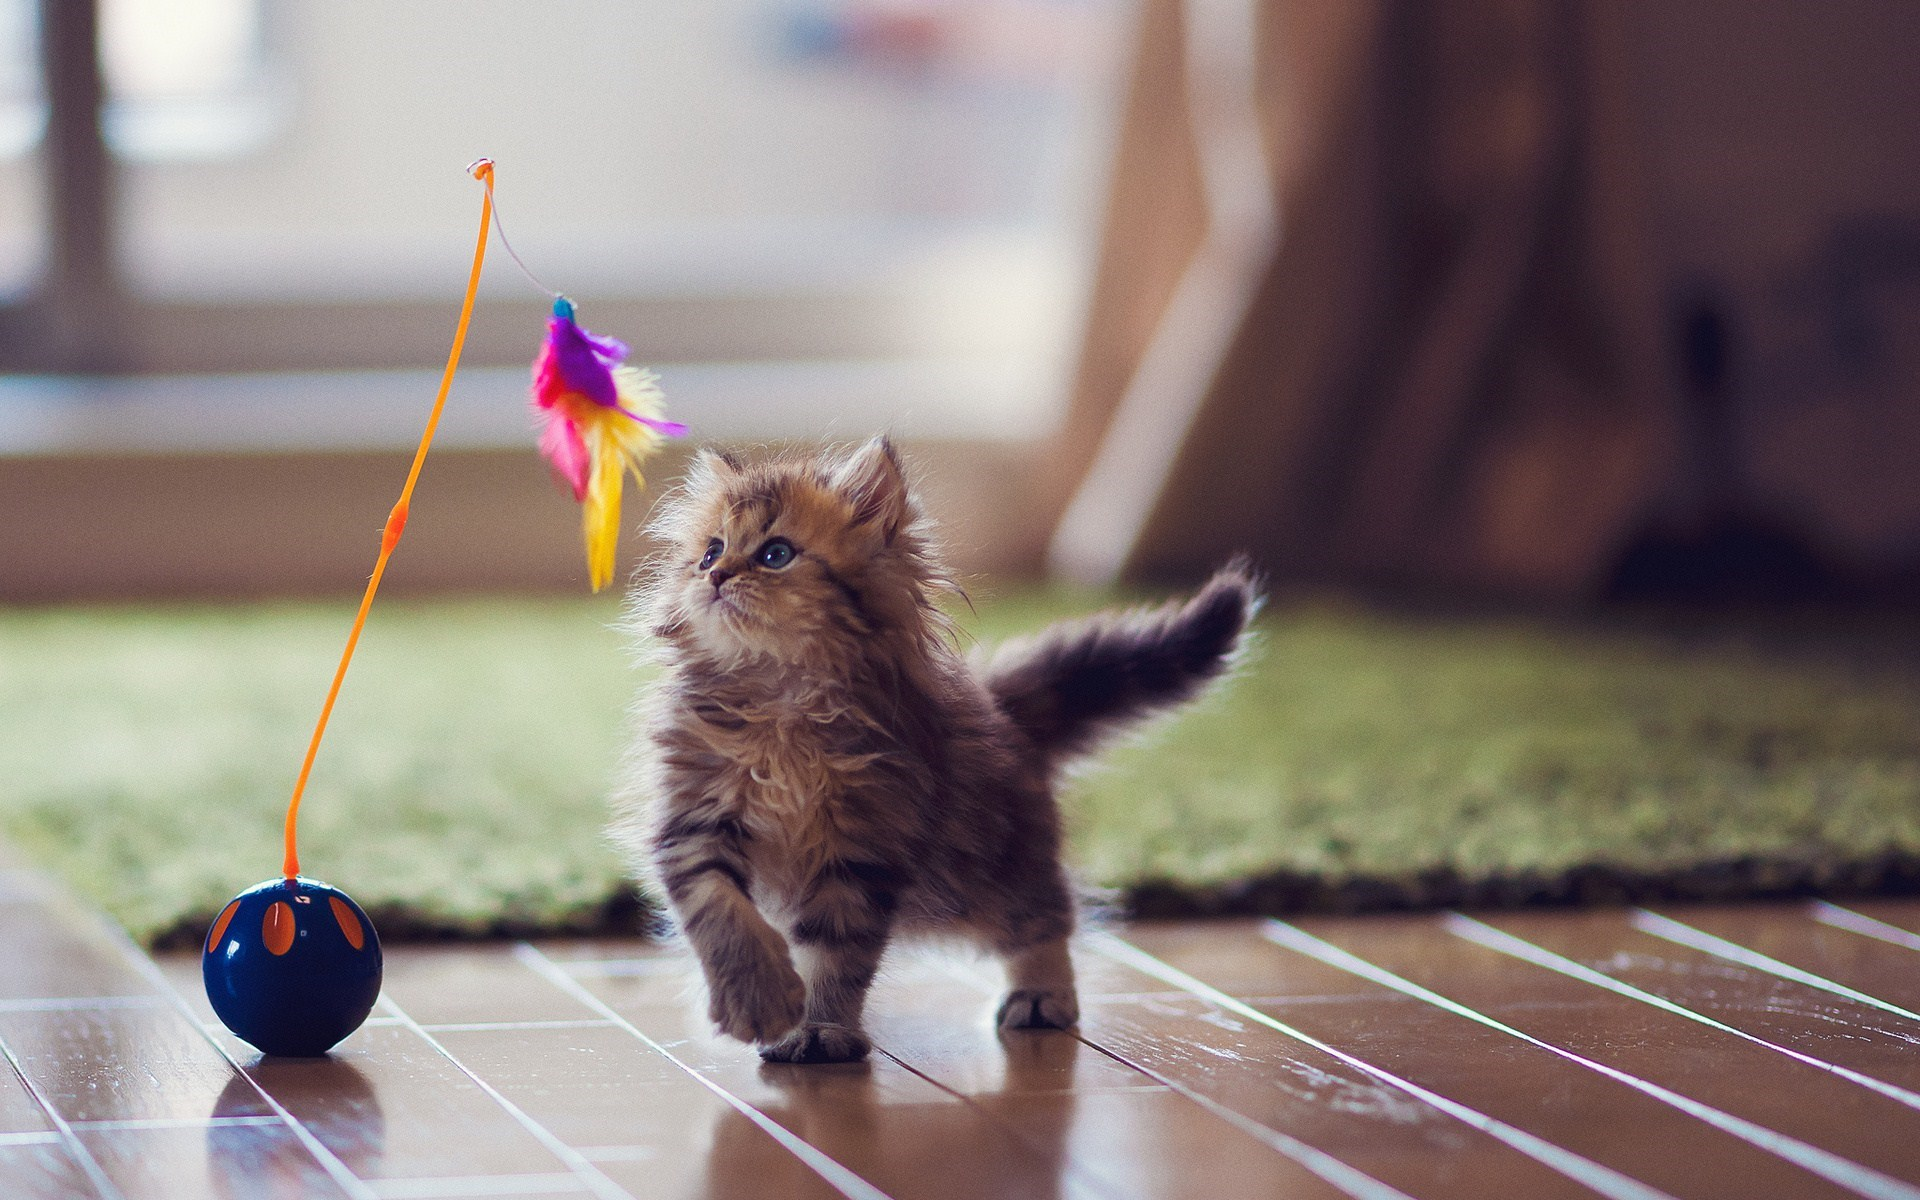 Cute Kitten Play Toy Photo